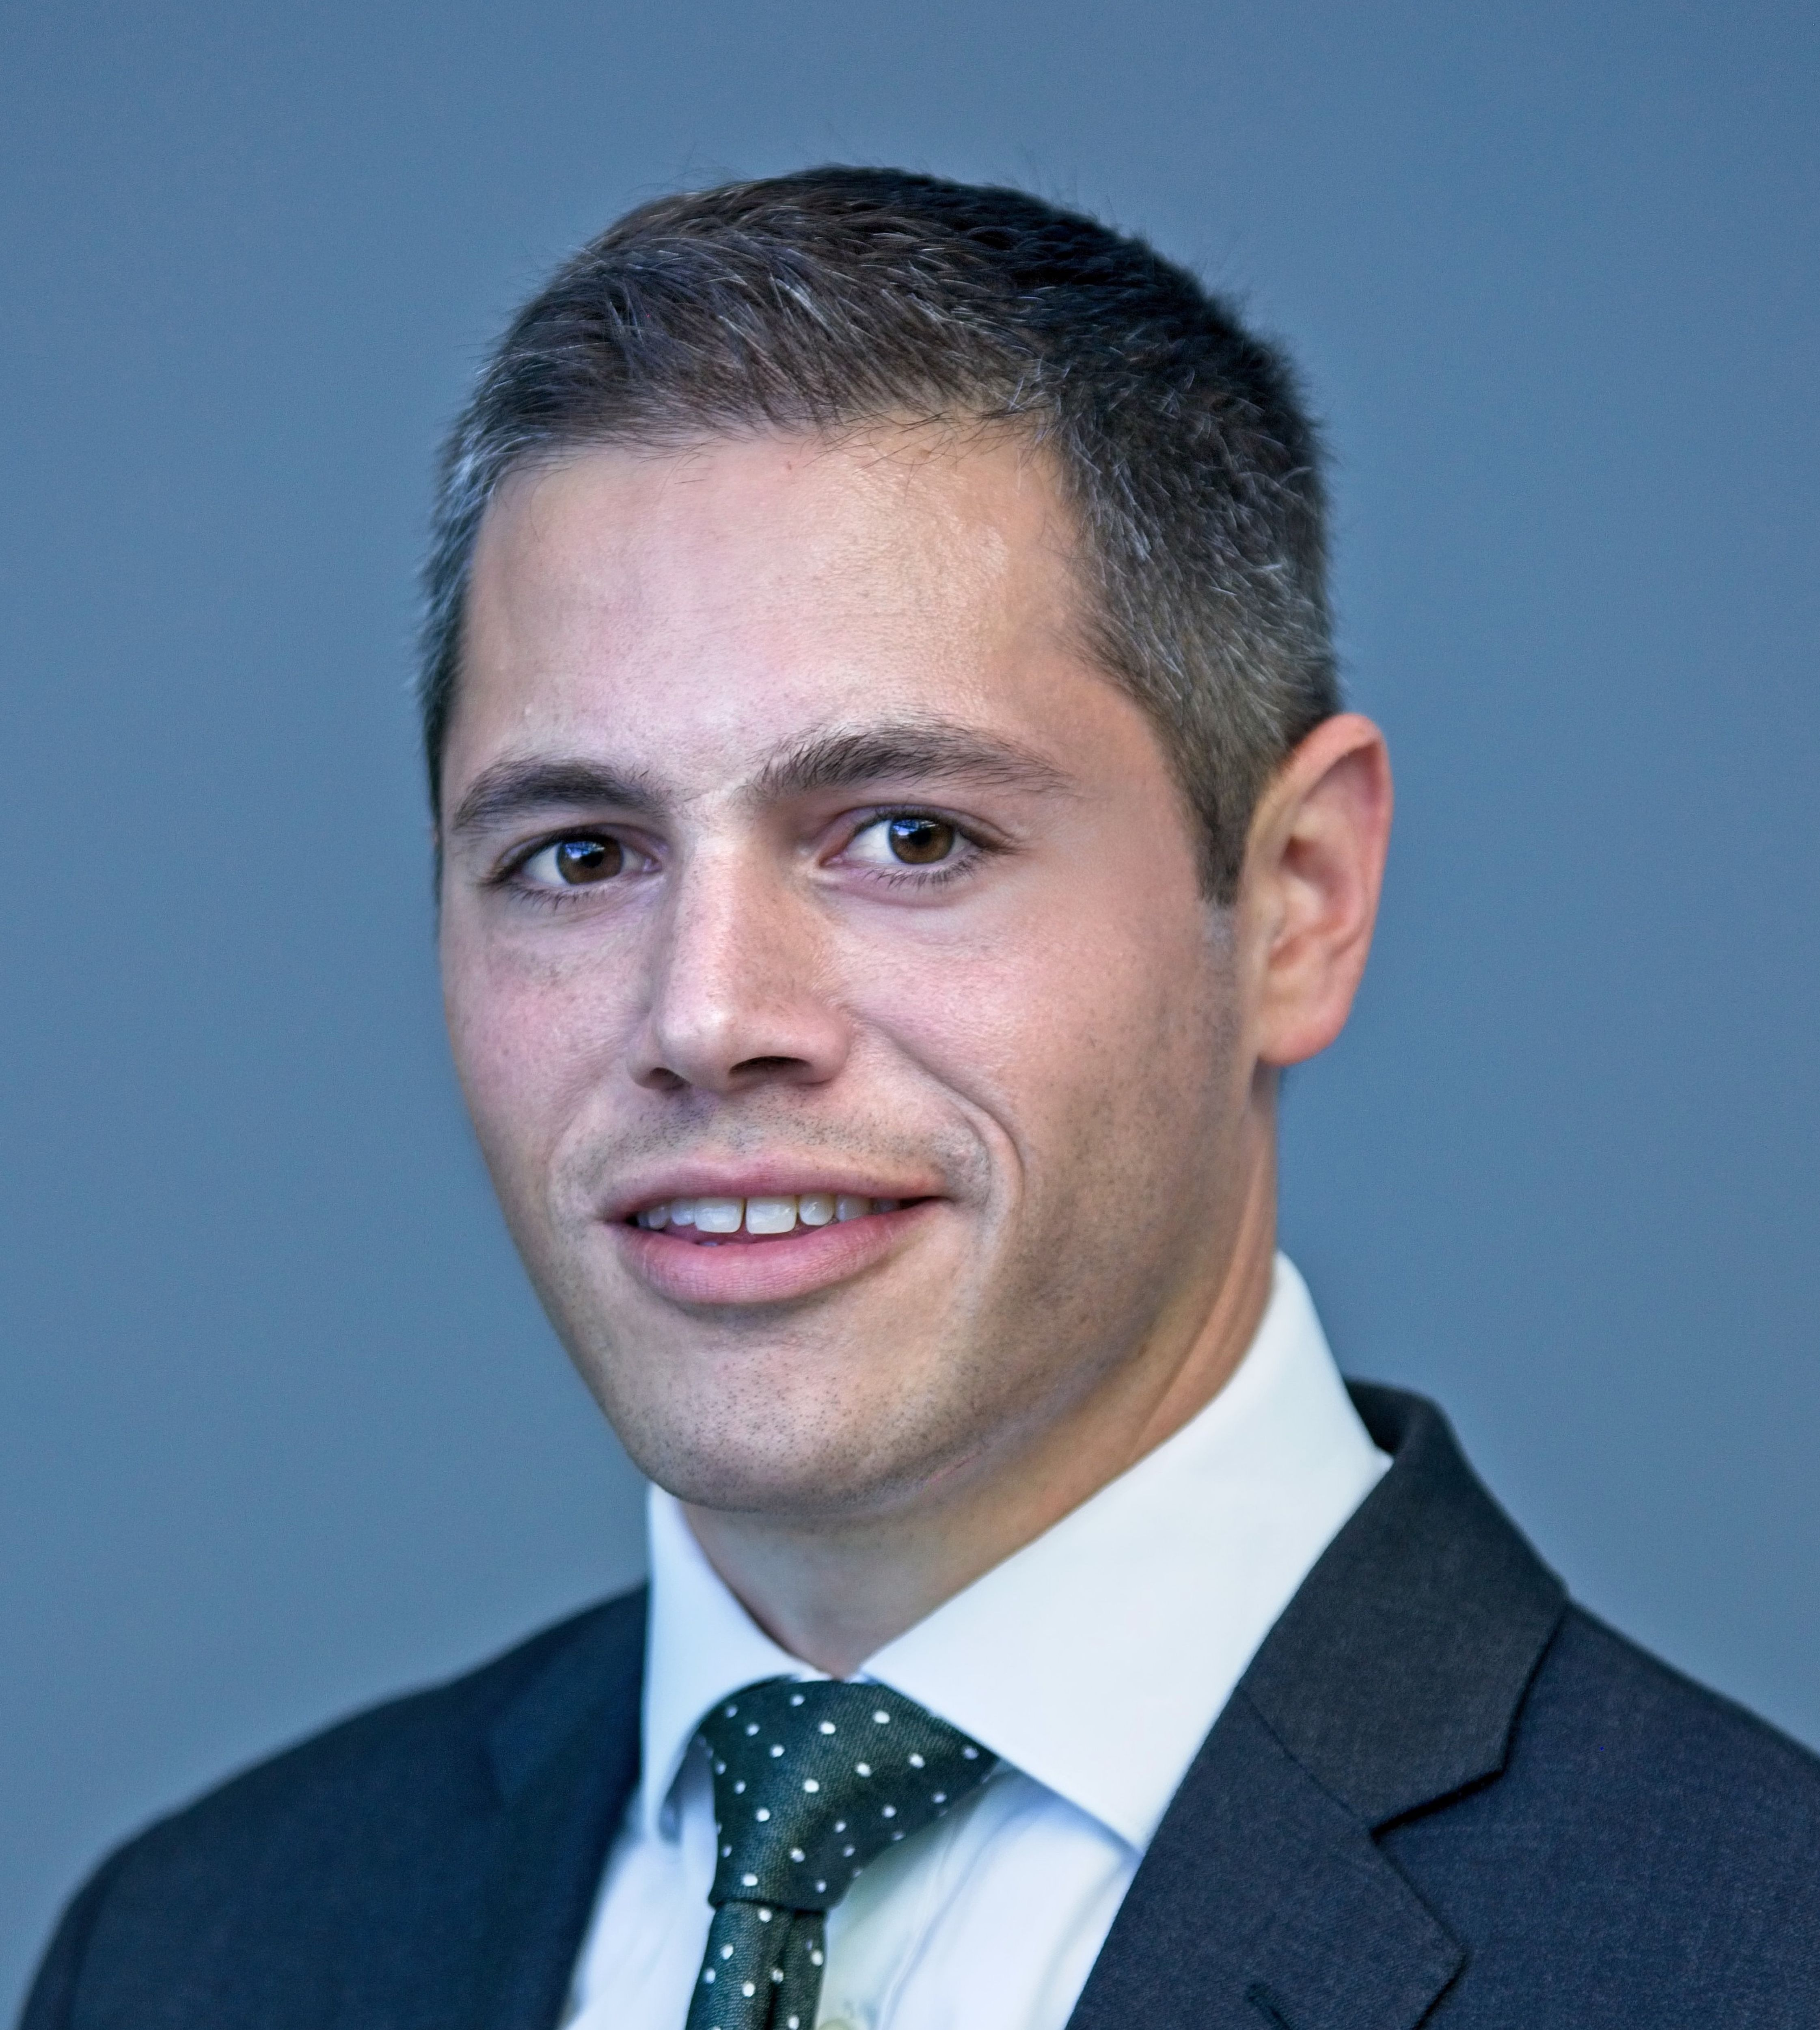 Daniel Ison